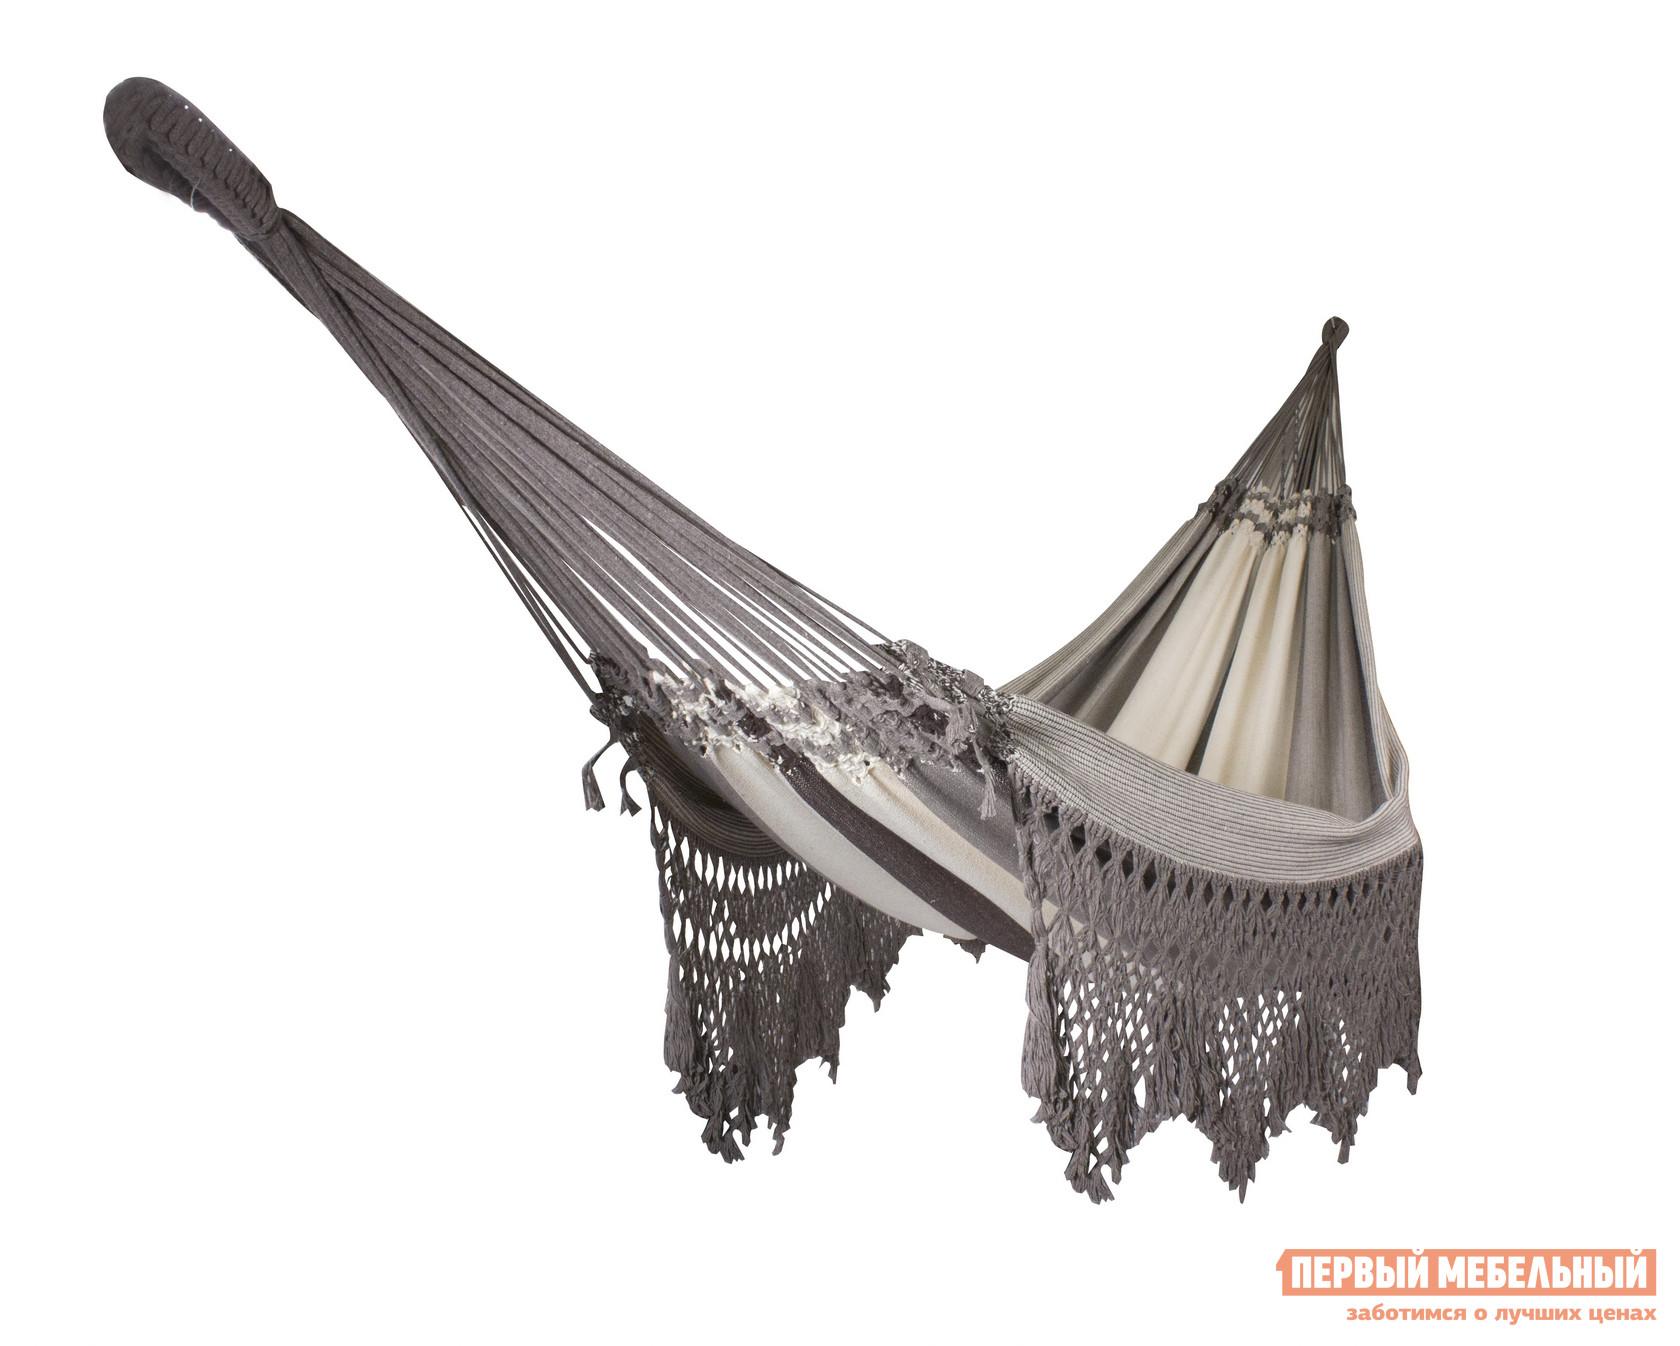 Гамак Мебель Импэкс BHF-01 гамак дачная мебель гамак тканый